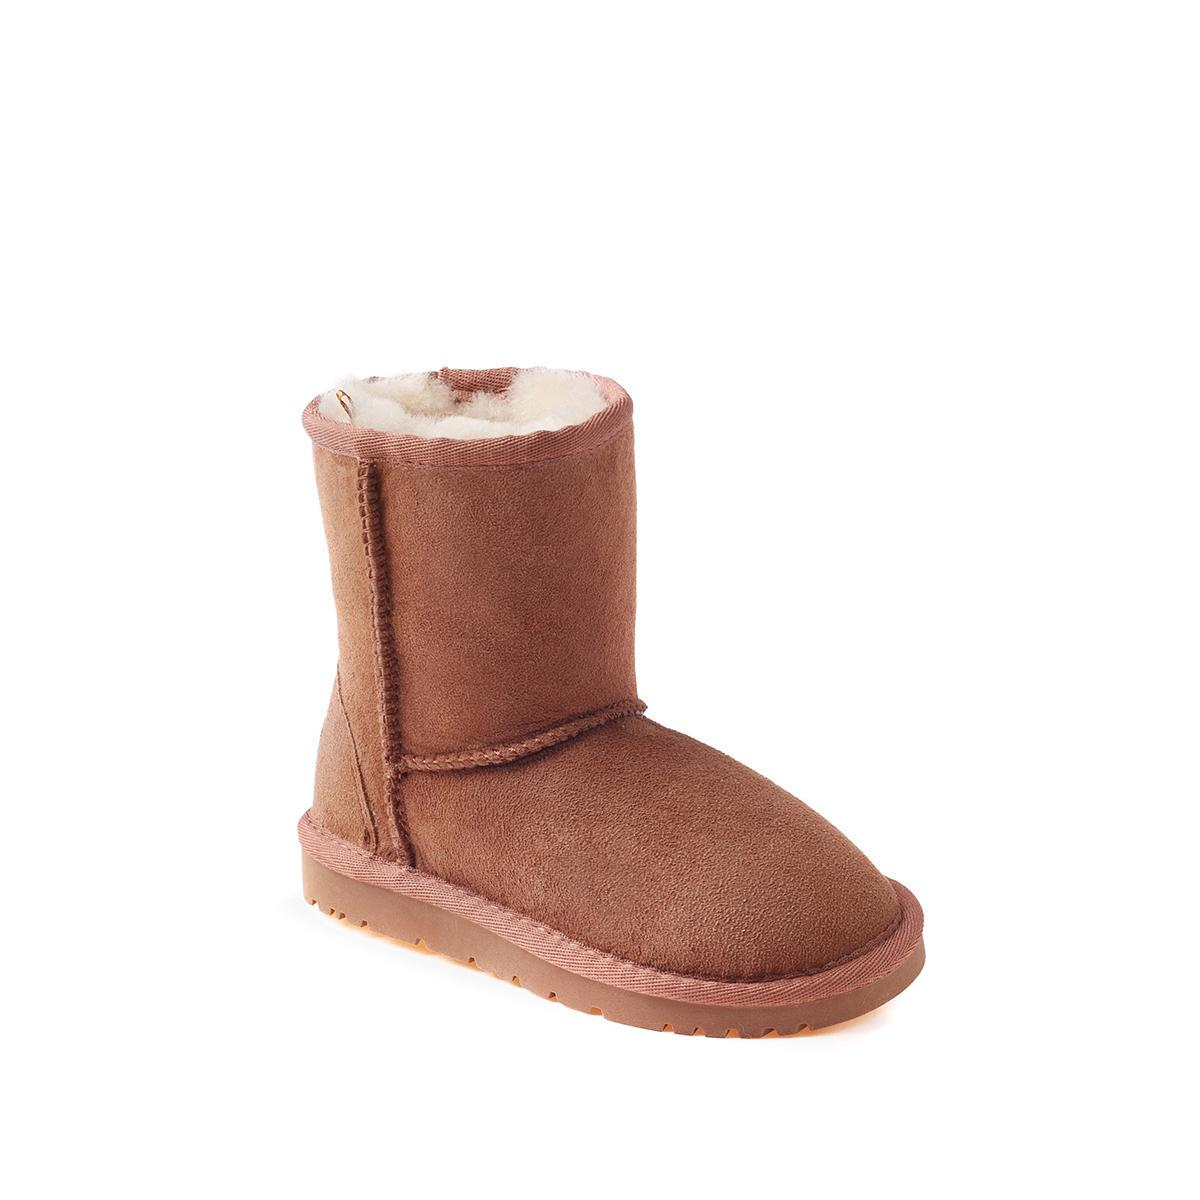 OZWEAR UGG Kids Ugg Boots (Water